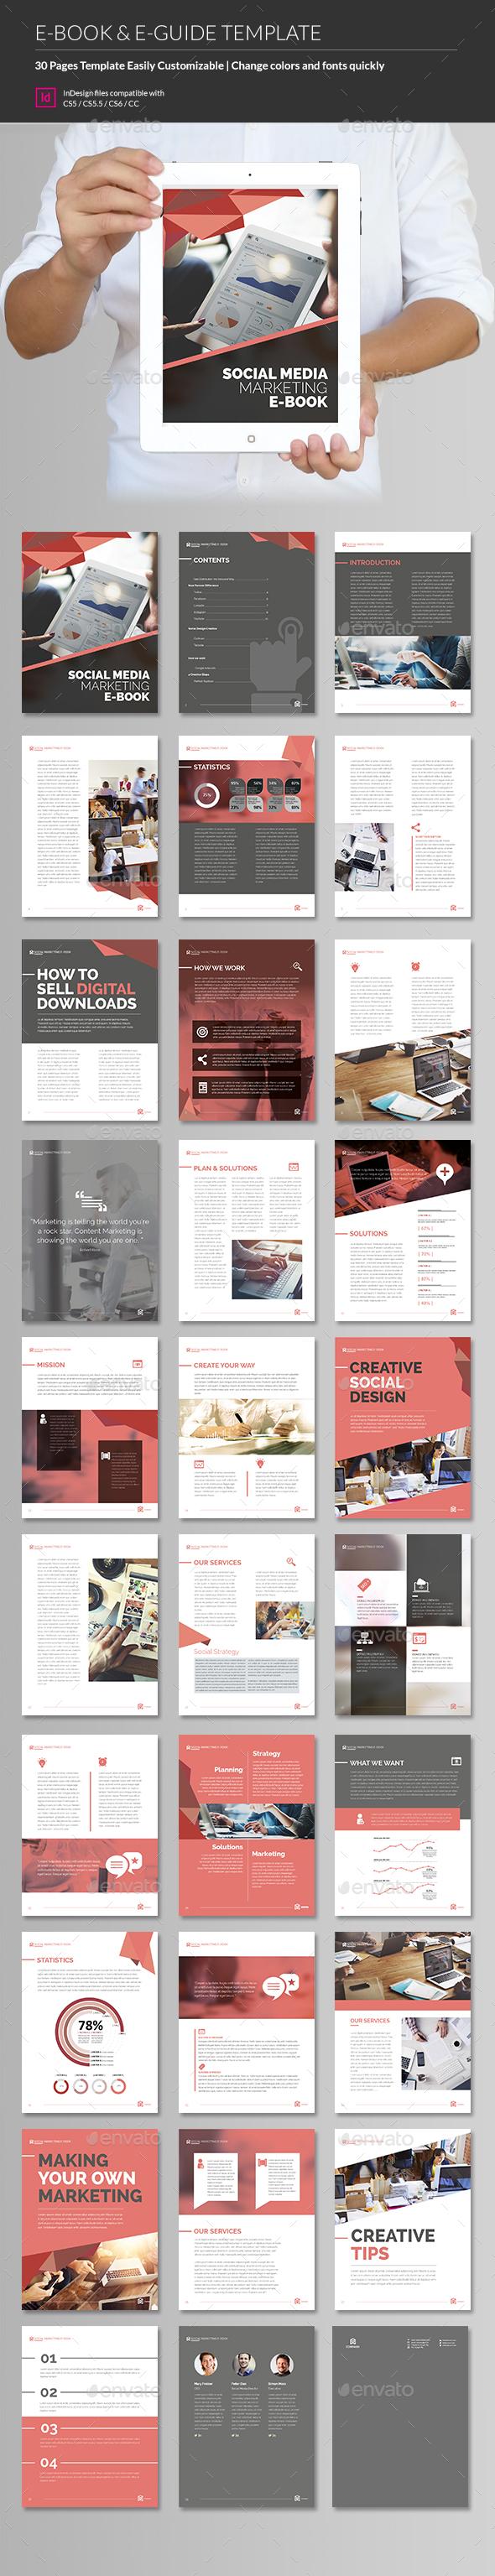 Ebook Eguide Template - Digital Books ePublishing